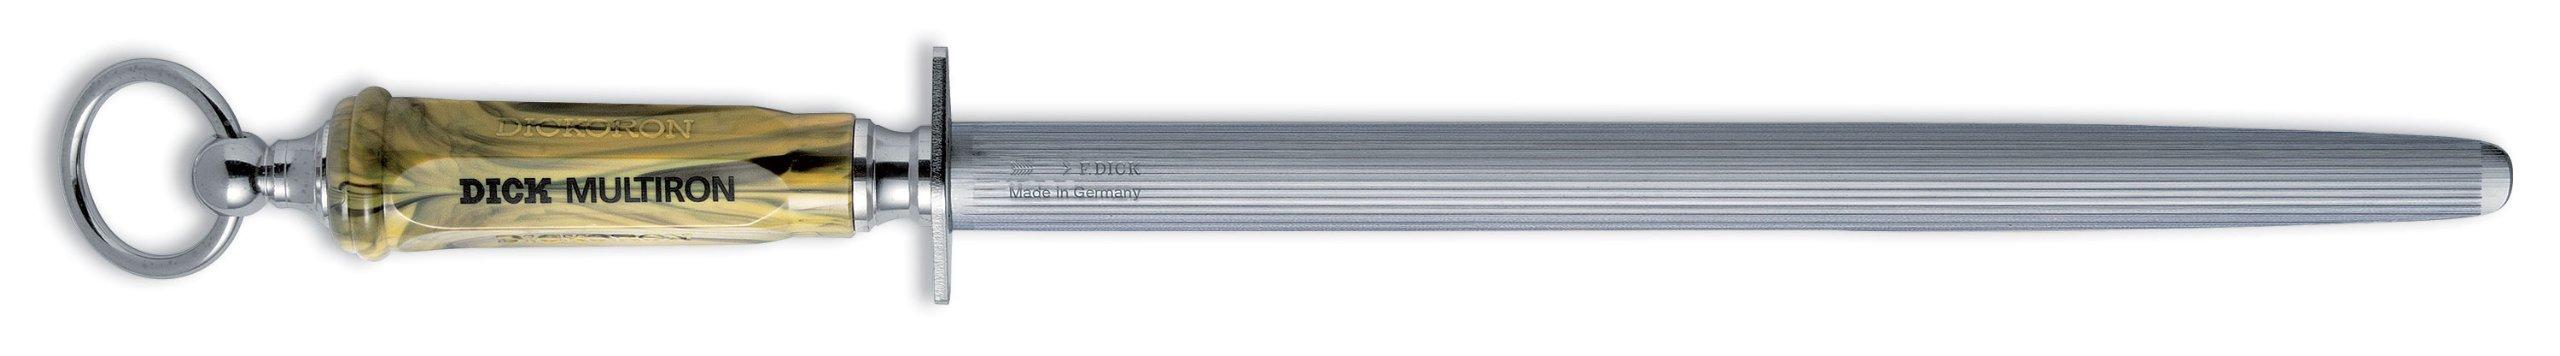 Dick Multiron Sharpening Steel, Fine & Regular Cut, 12-inch, #7650330 by Friedr. Dick Germany